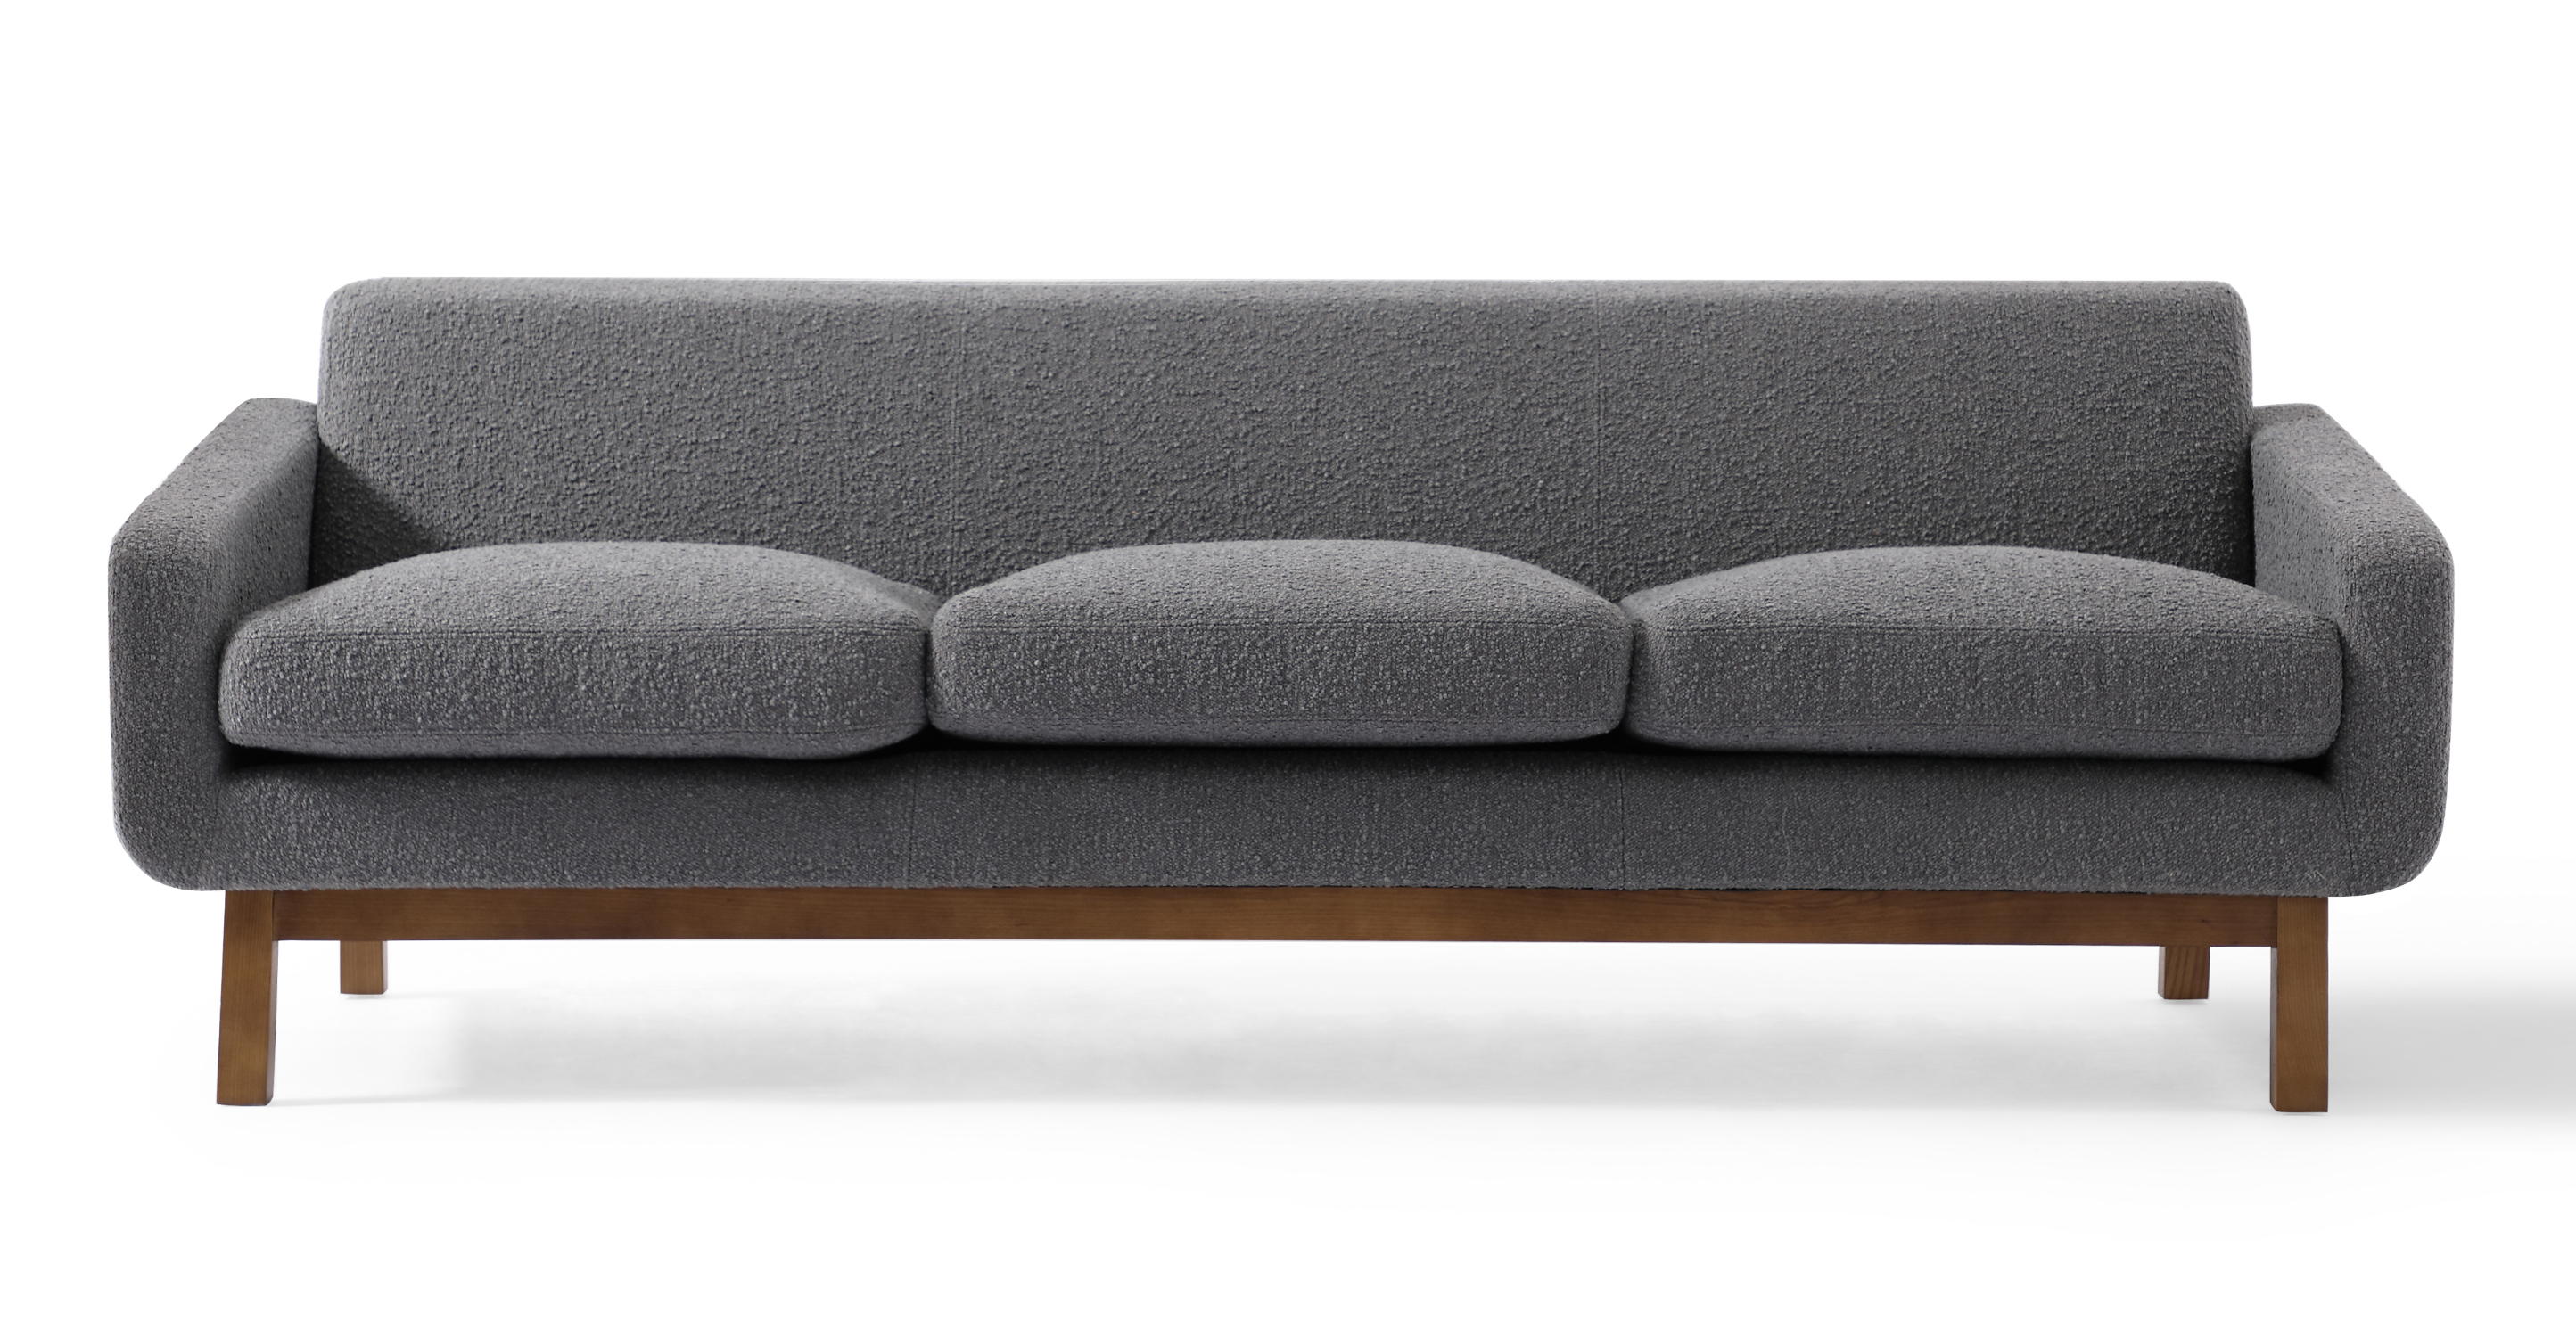 "Platform 80"" Fabric Sofa, Walnut/Gris Boucle"